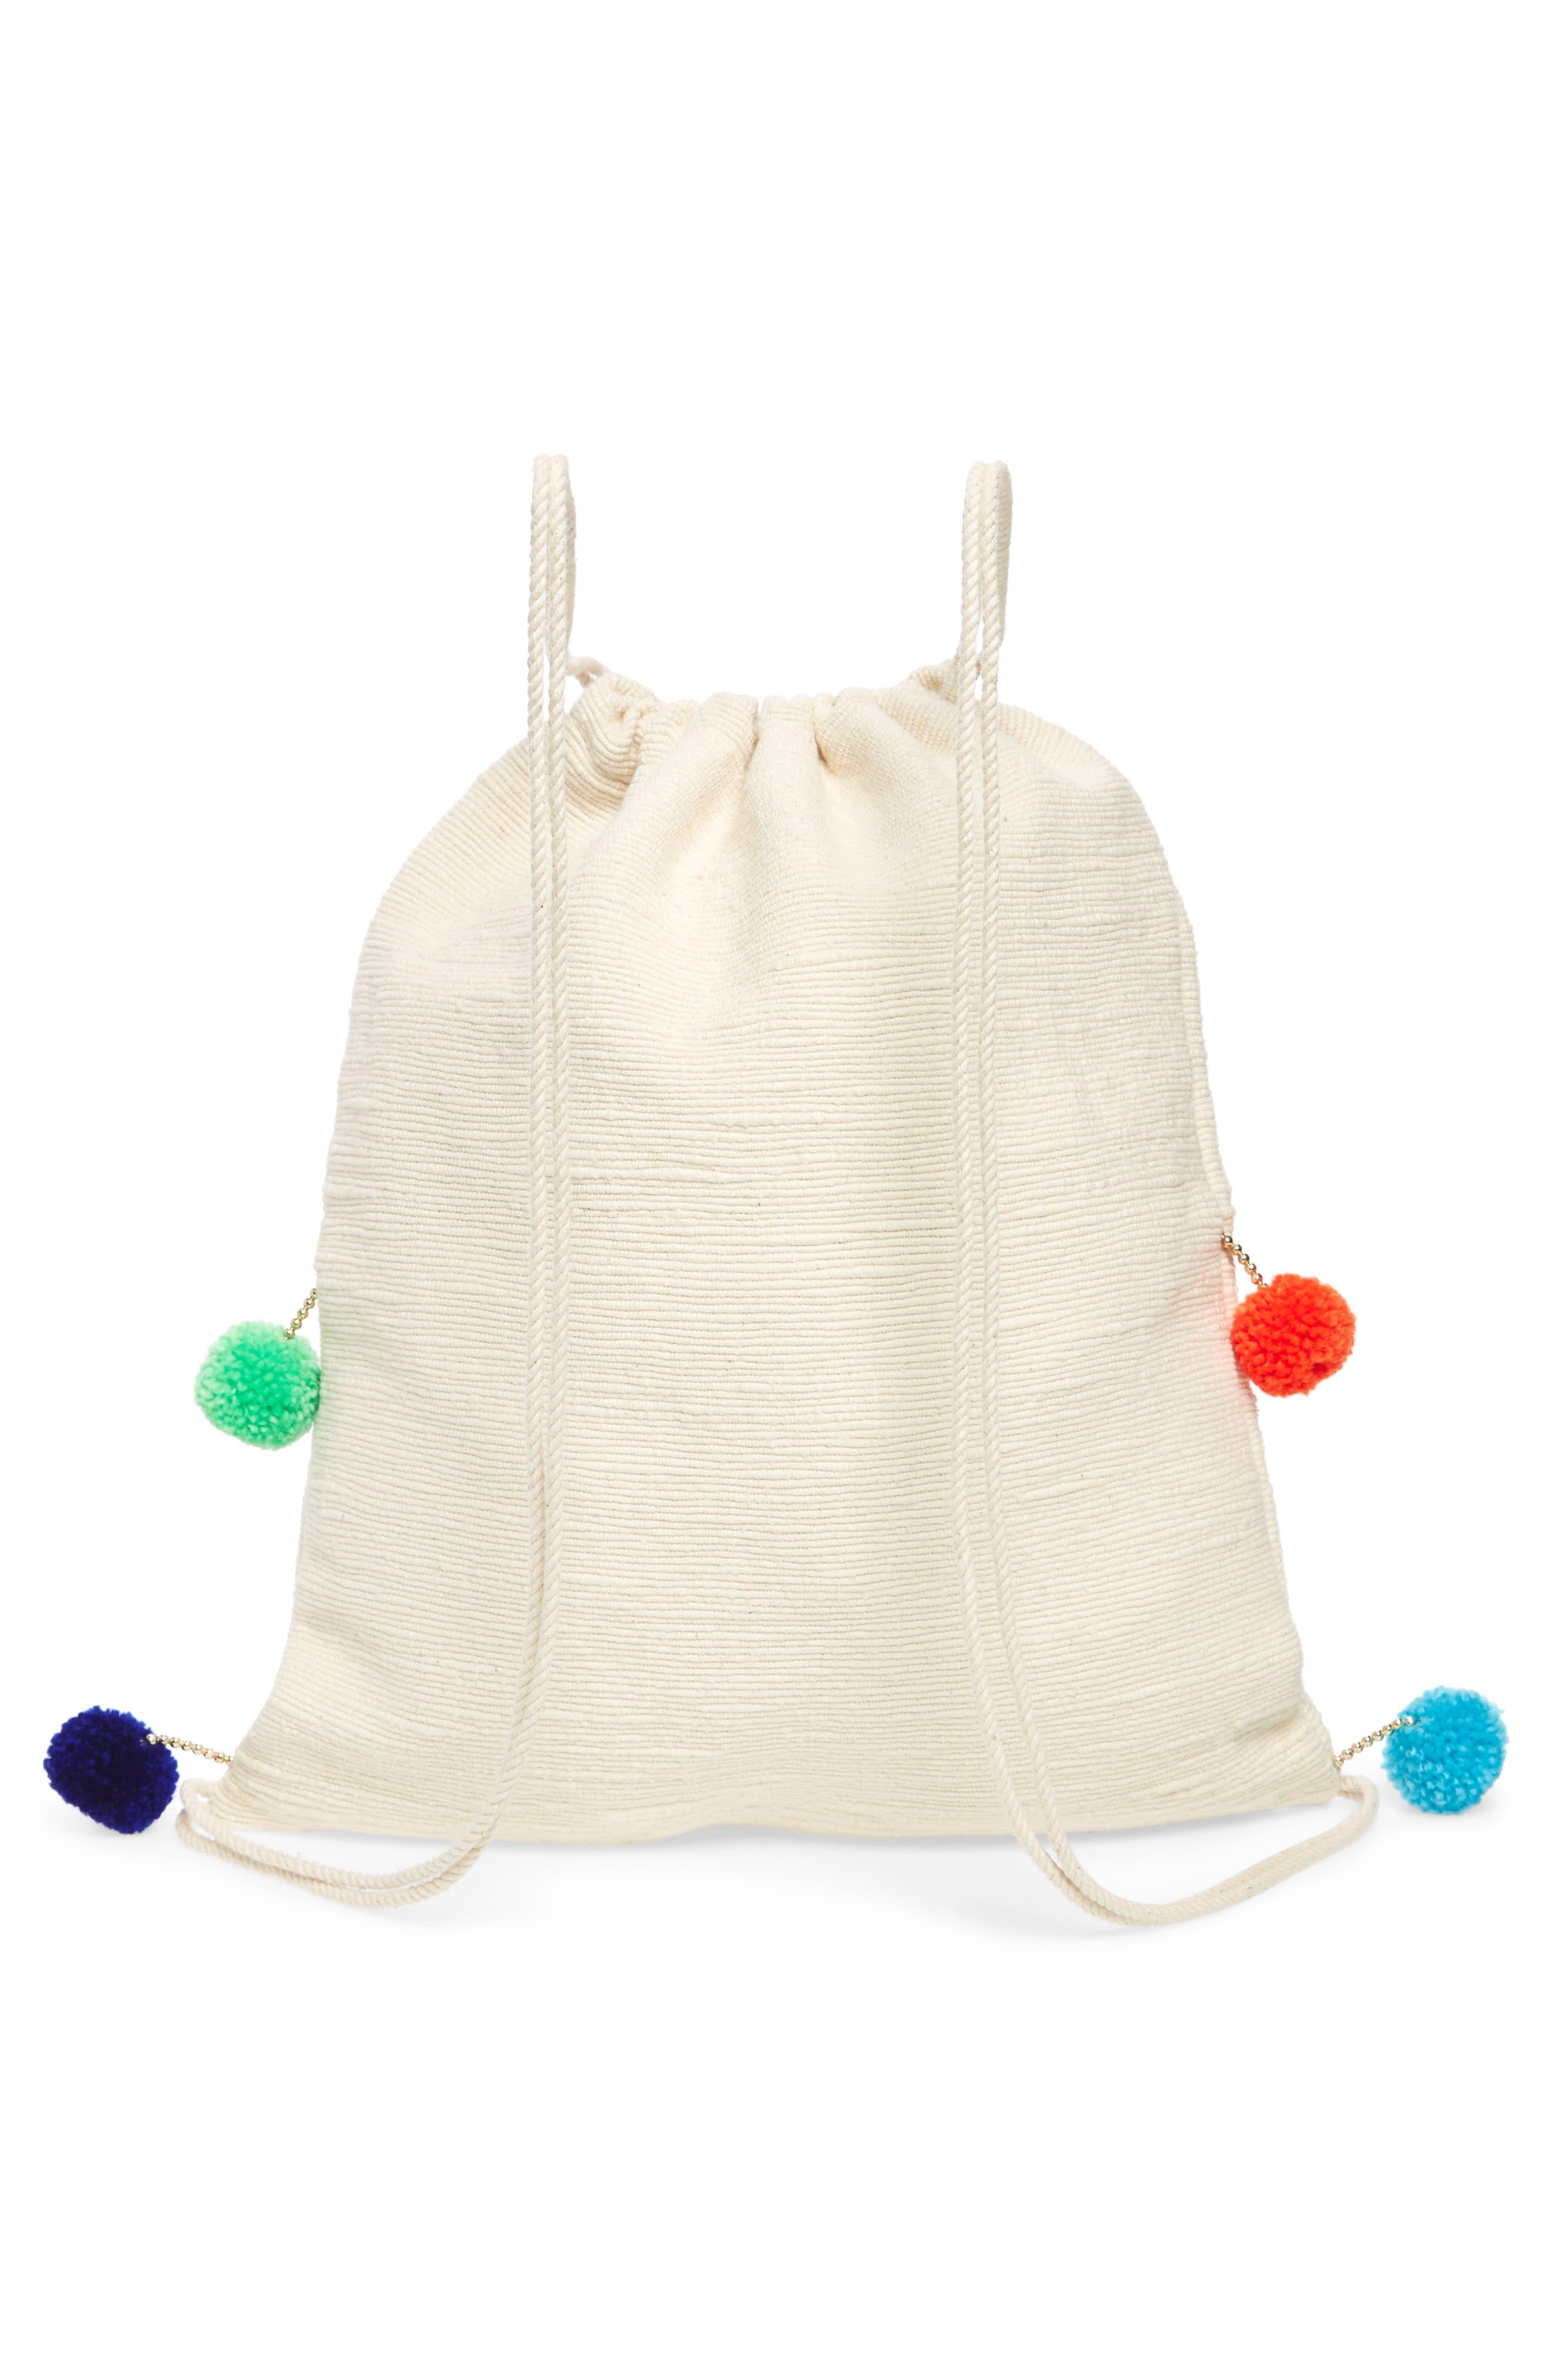 Pompom Drawstring Bag,                             Alternate thumbnail 3, color,                             200